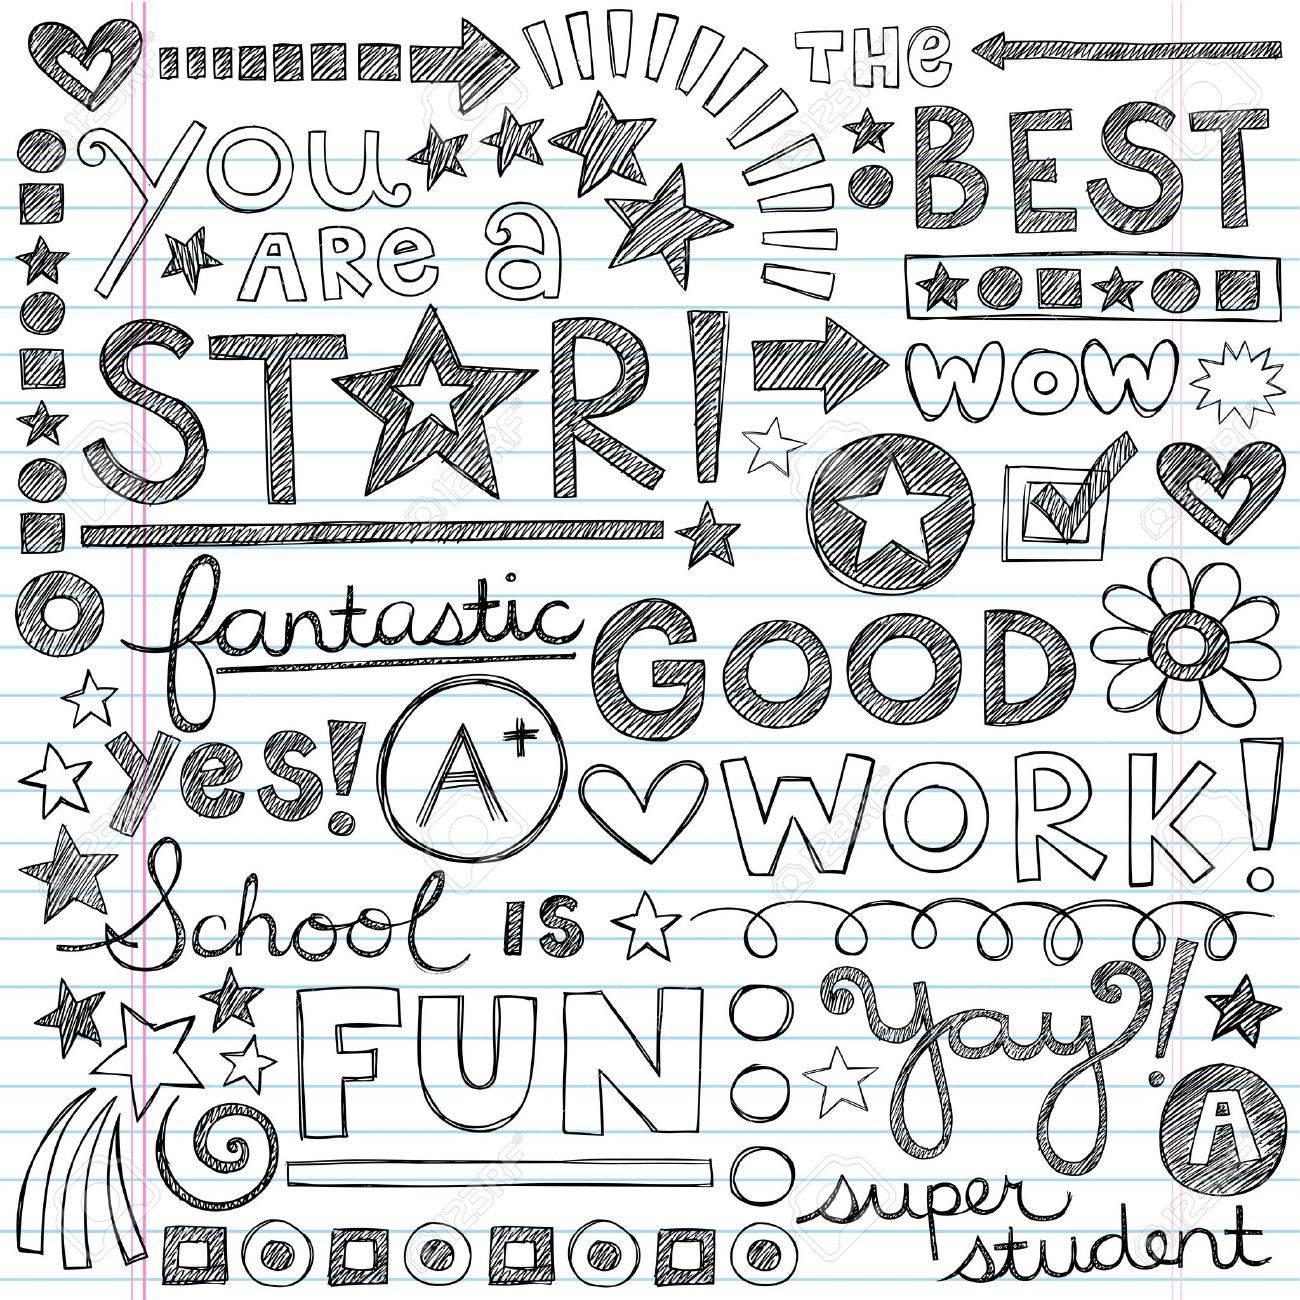 Great Work Super Praise Phrases Back to School Sketchy Notebook Doodles- Hand-Drawn Illustration Design Elements on Lined Sketchbook Paper Background Stock Vector - 19978385